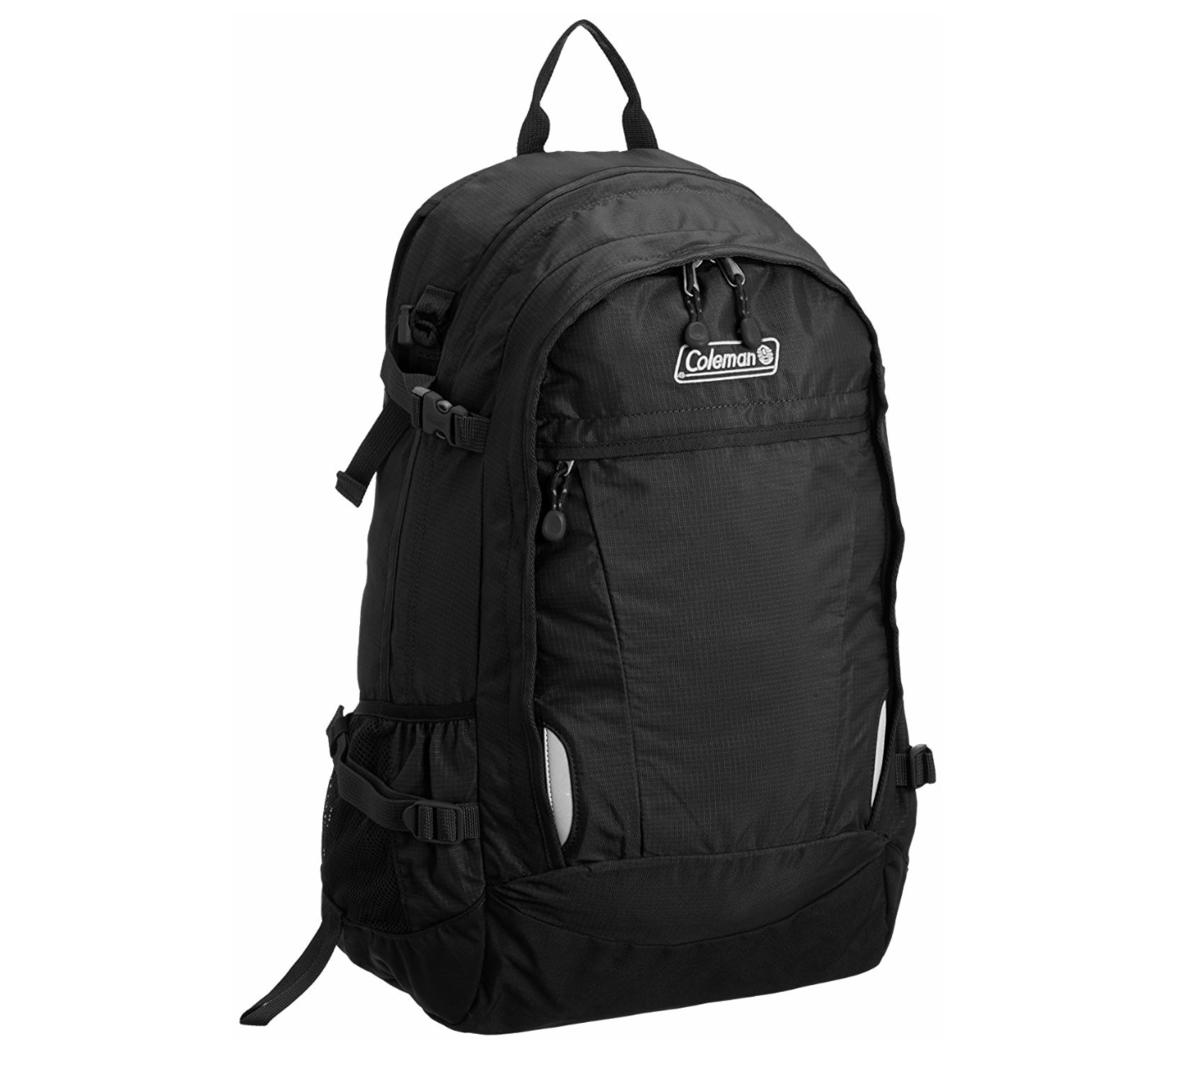 f:id:thebackpack:20190315203855p:plain